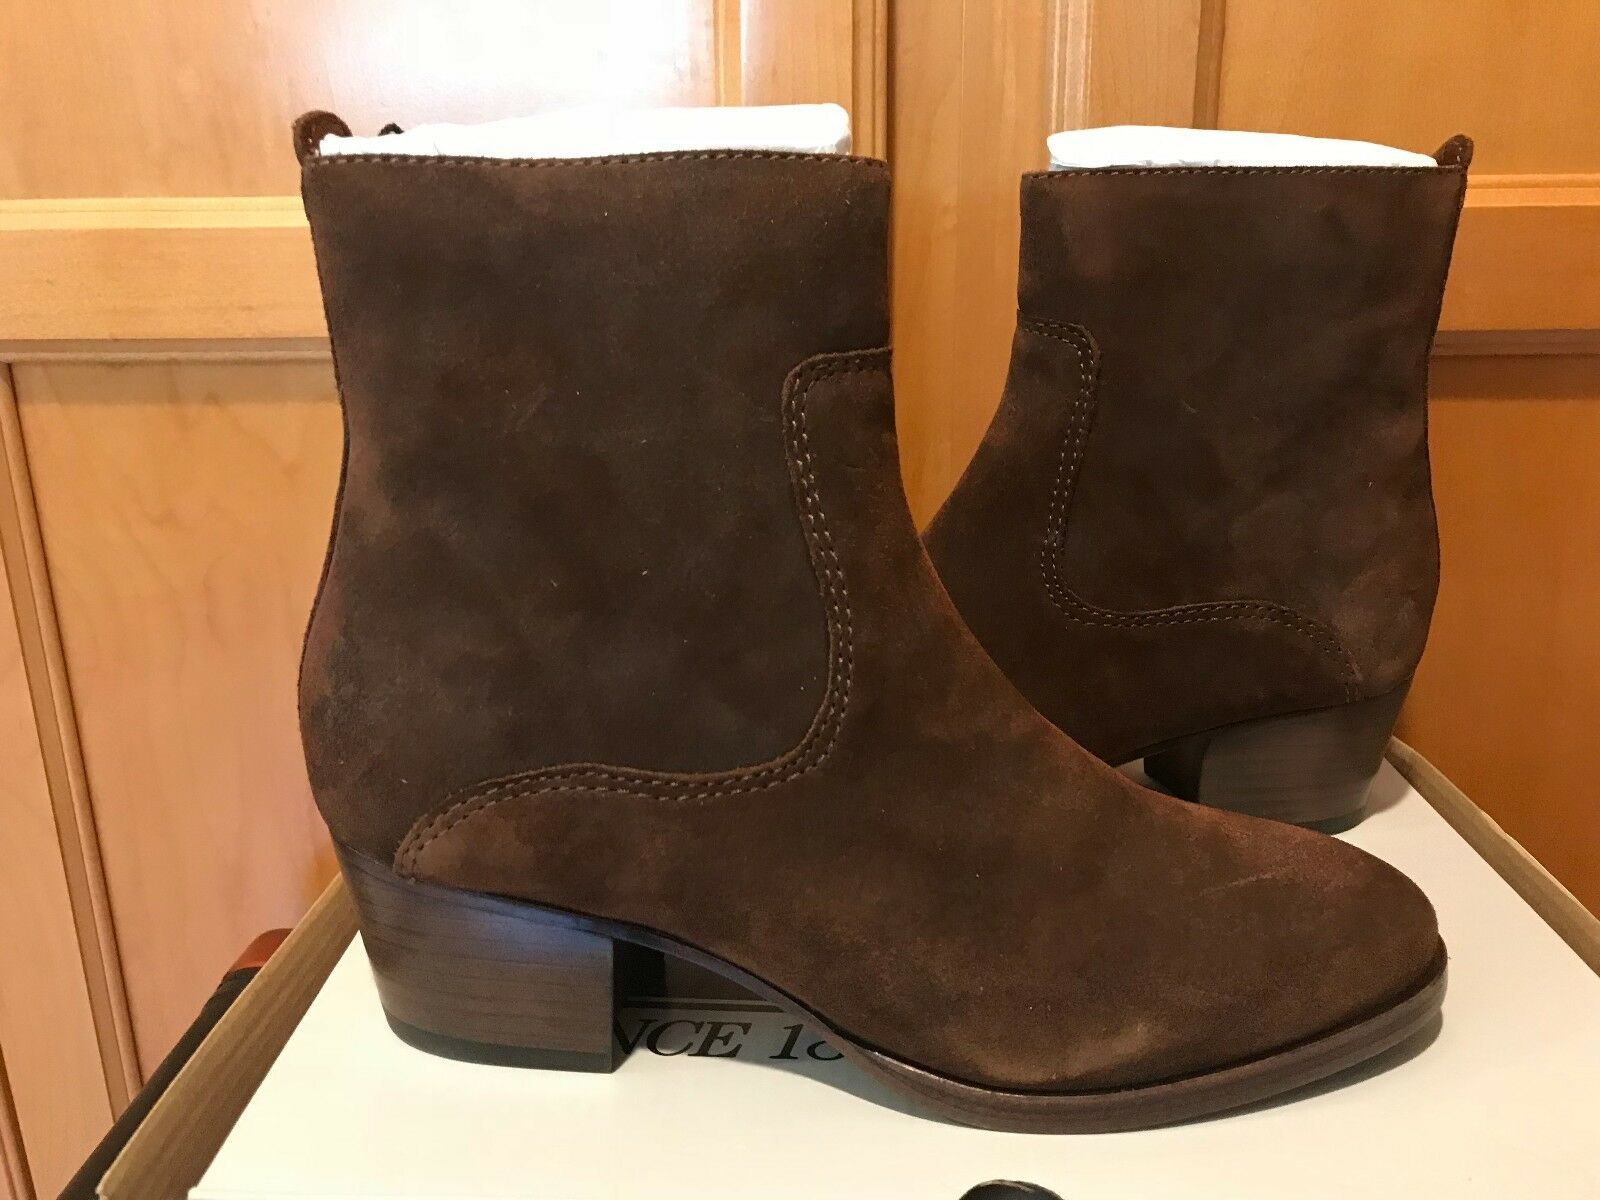 NIB NEW Frye Clara Zip Short Ankle stivali avvioies Marronee Dimensione 6 M